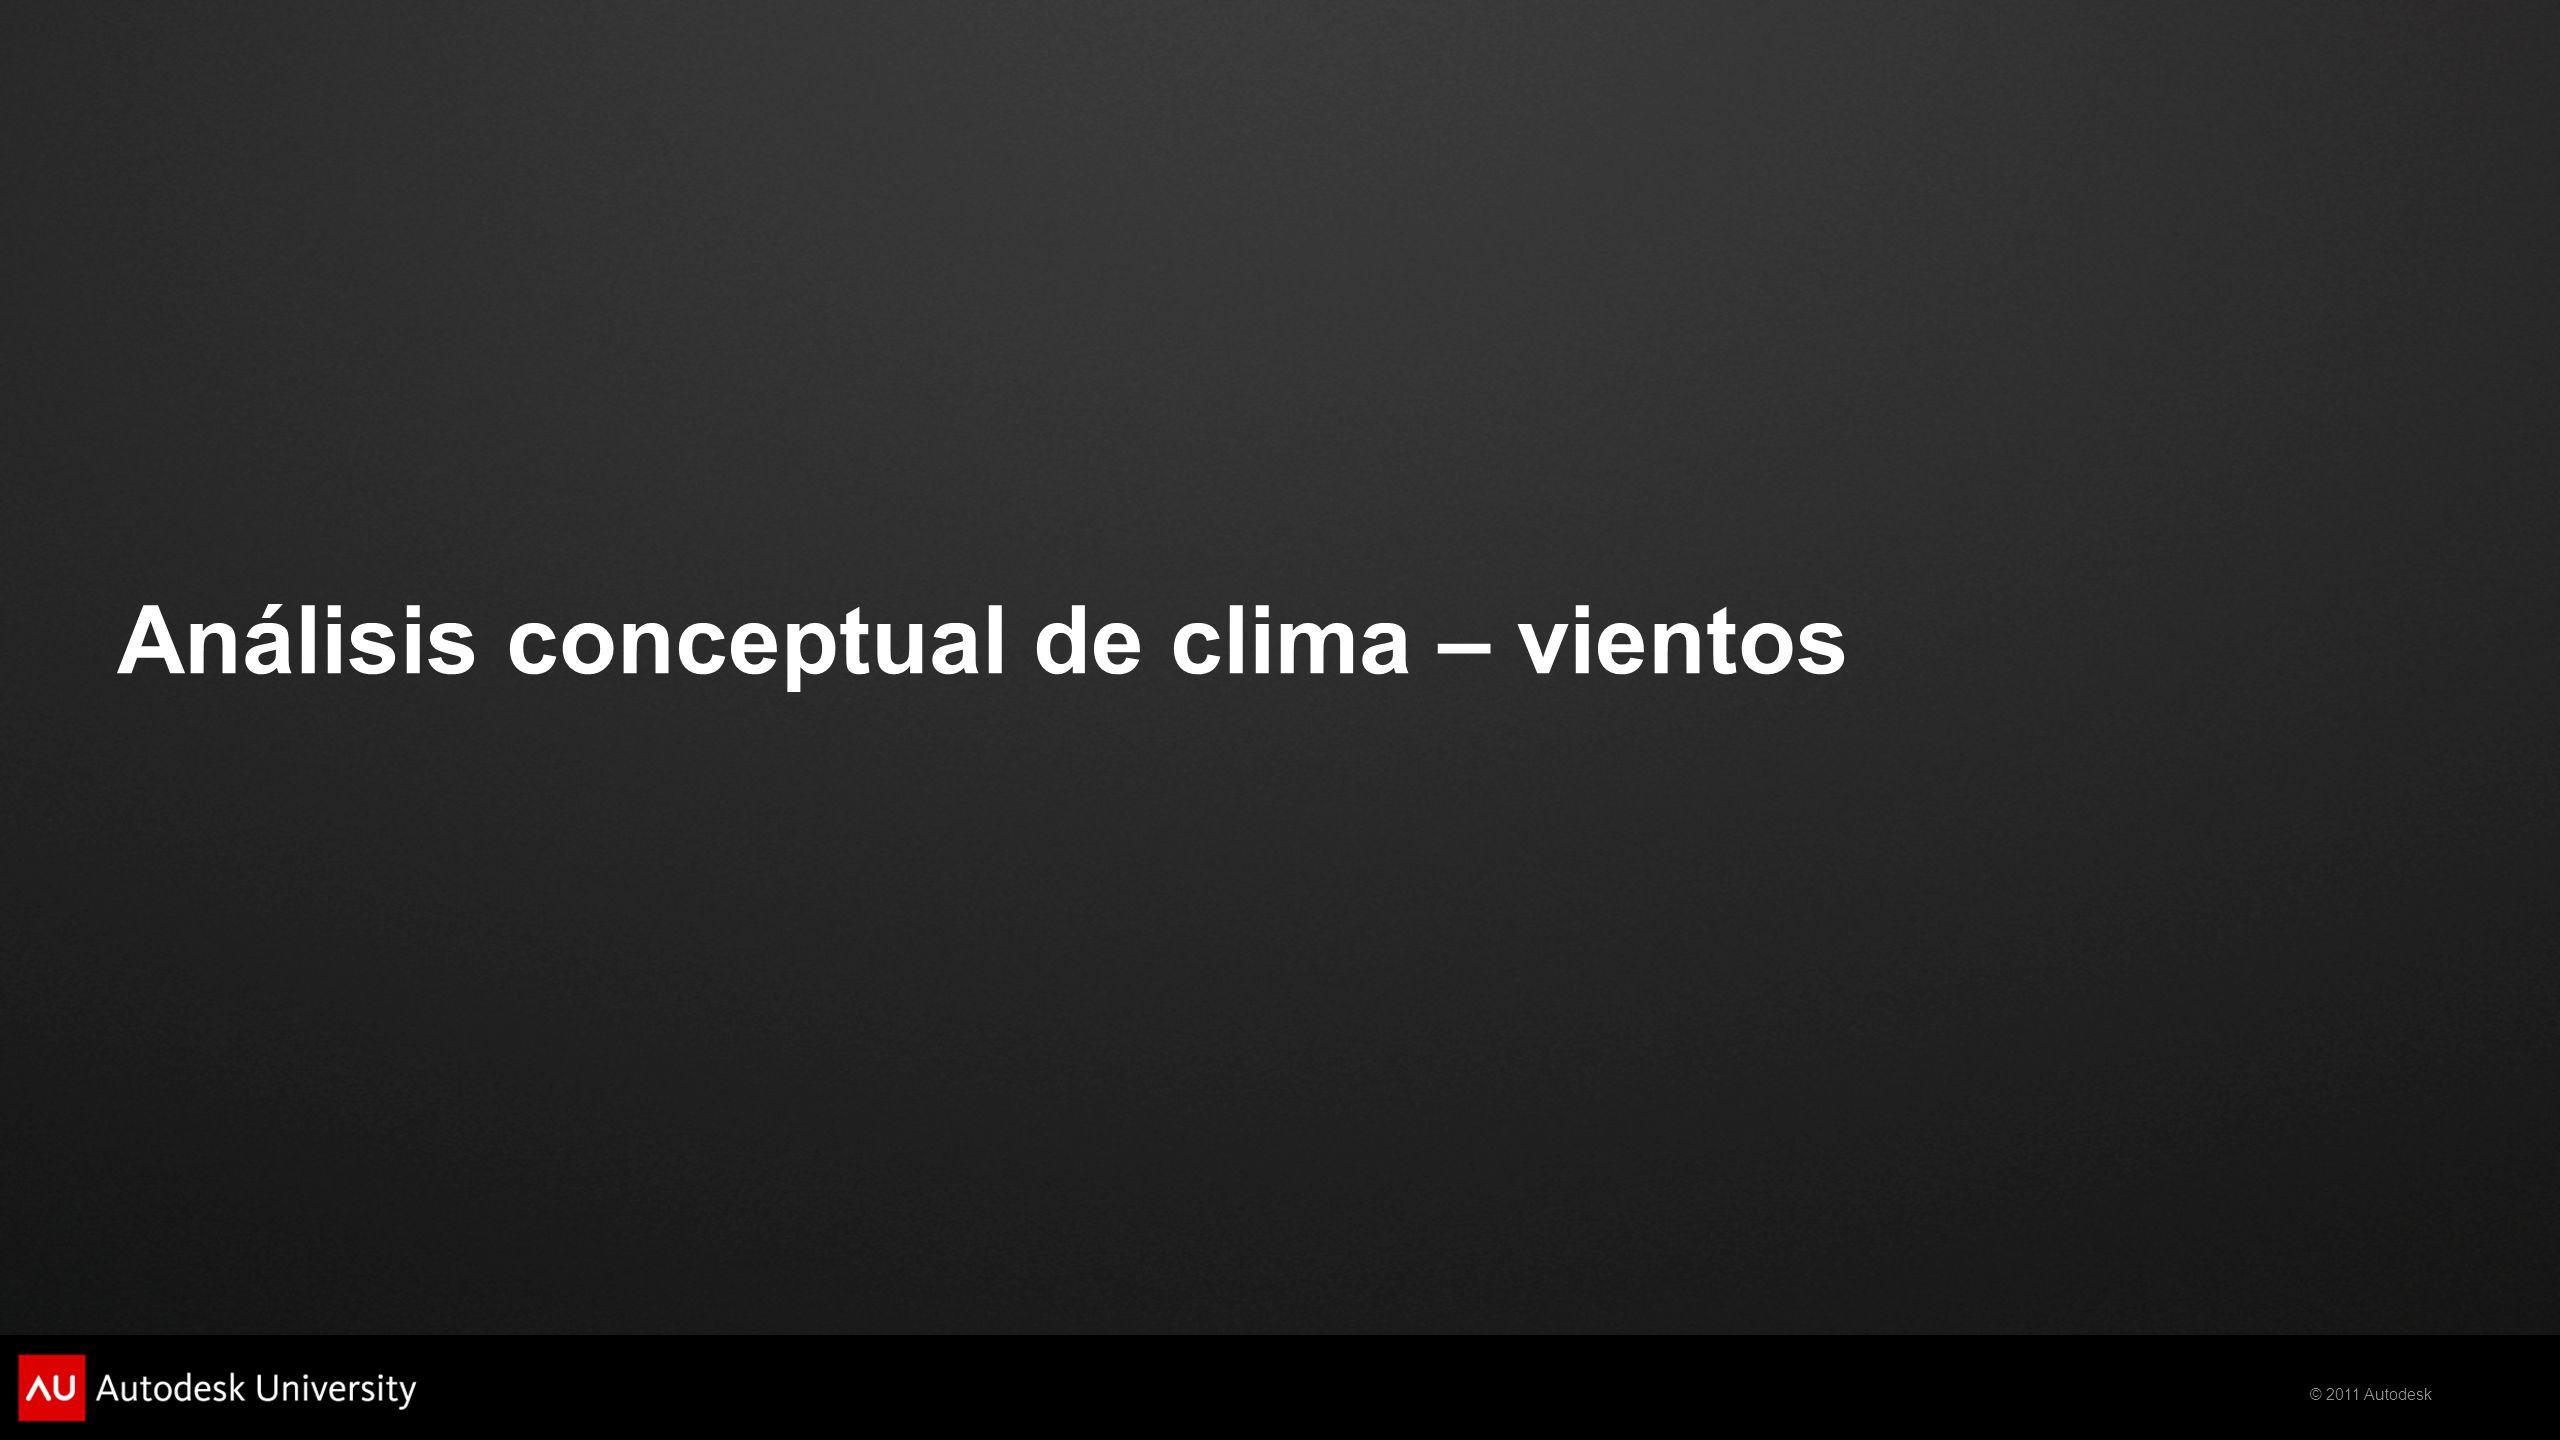 Análisis conceptual de clima – vientos